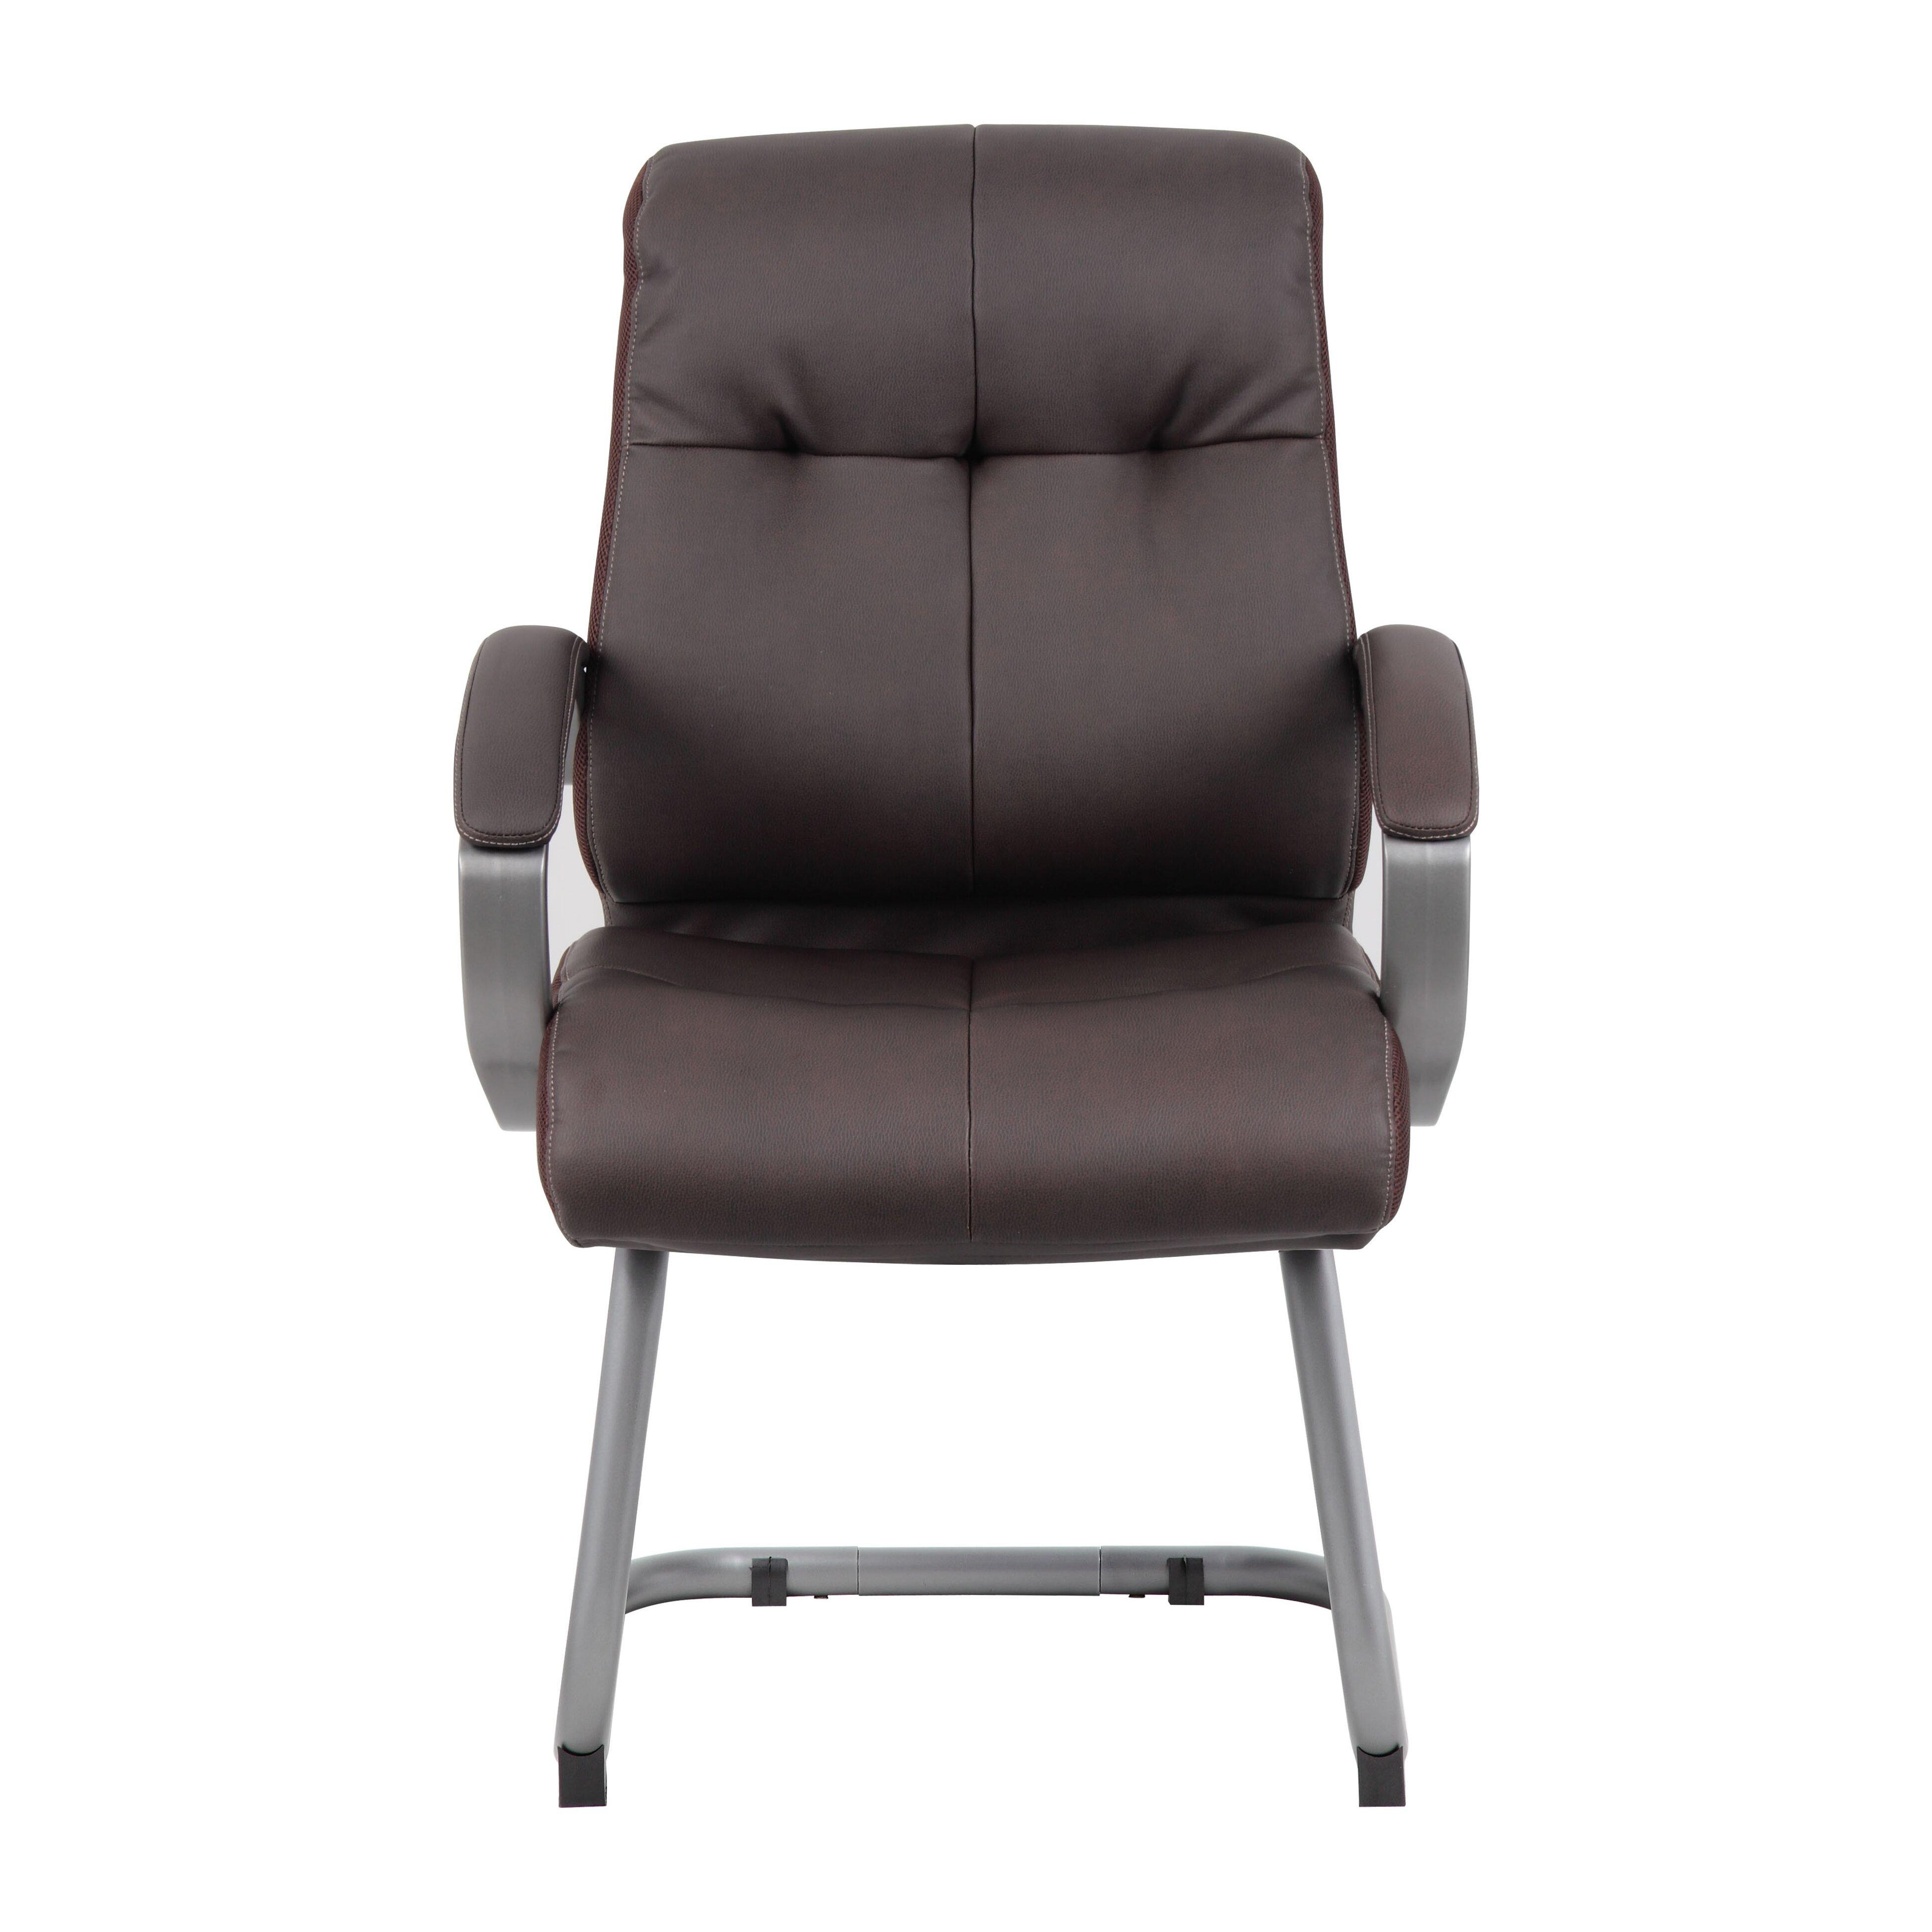 Boss Office Products Executive Guest Chair U0026 Reviews | Wayfair